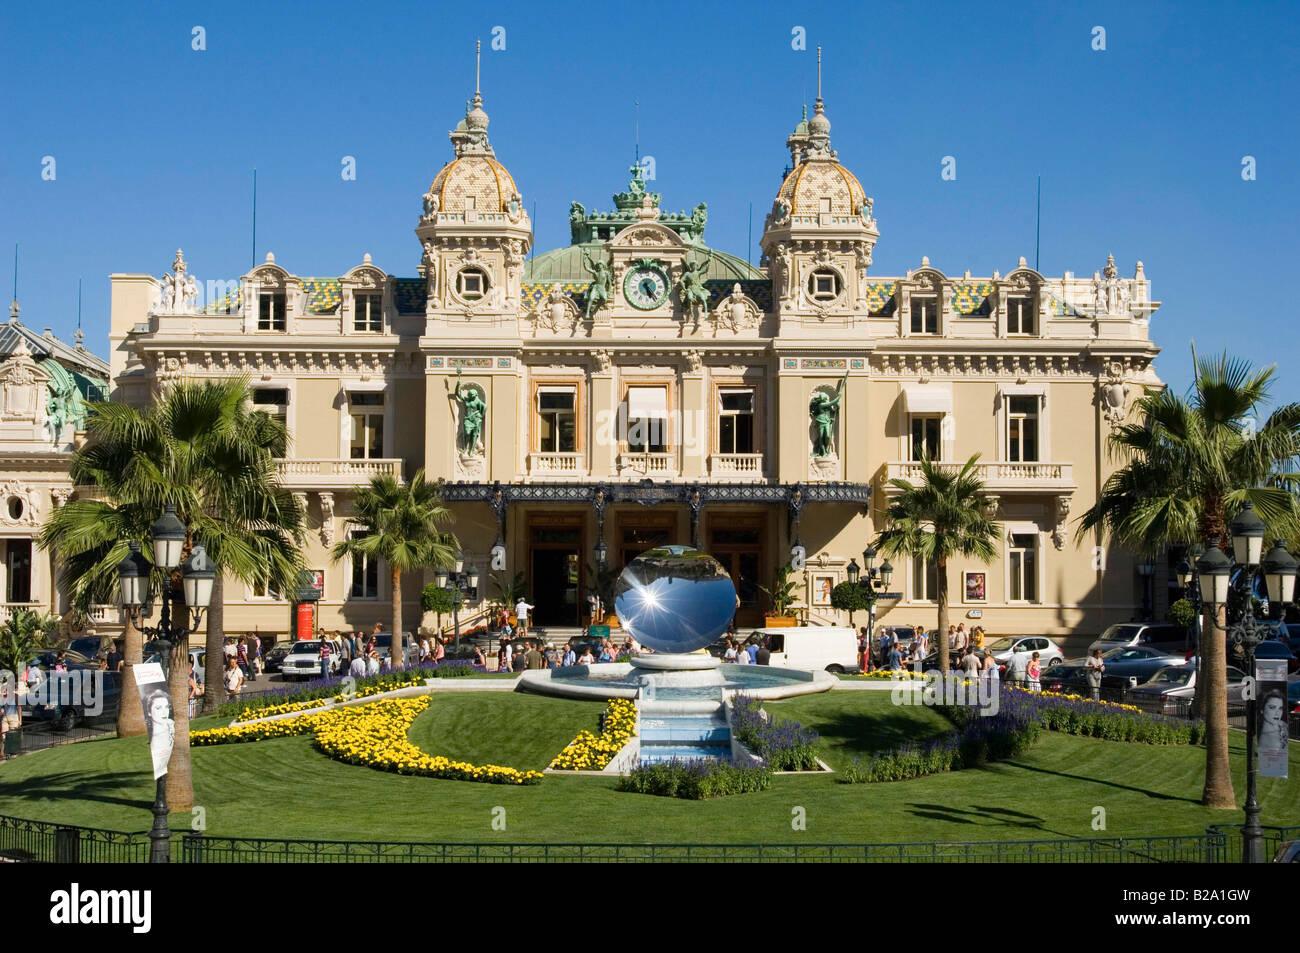 Principality of Monaco The Casino Date 12 02 2008 Ref WP B726 110139 0053 COMPULSORY CREDIT World Pictures Photoshot - Stock Image